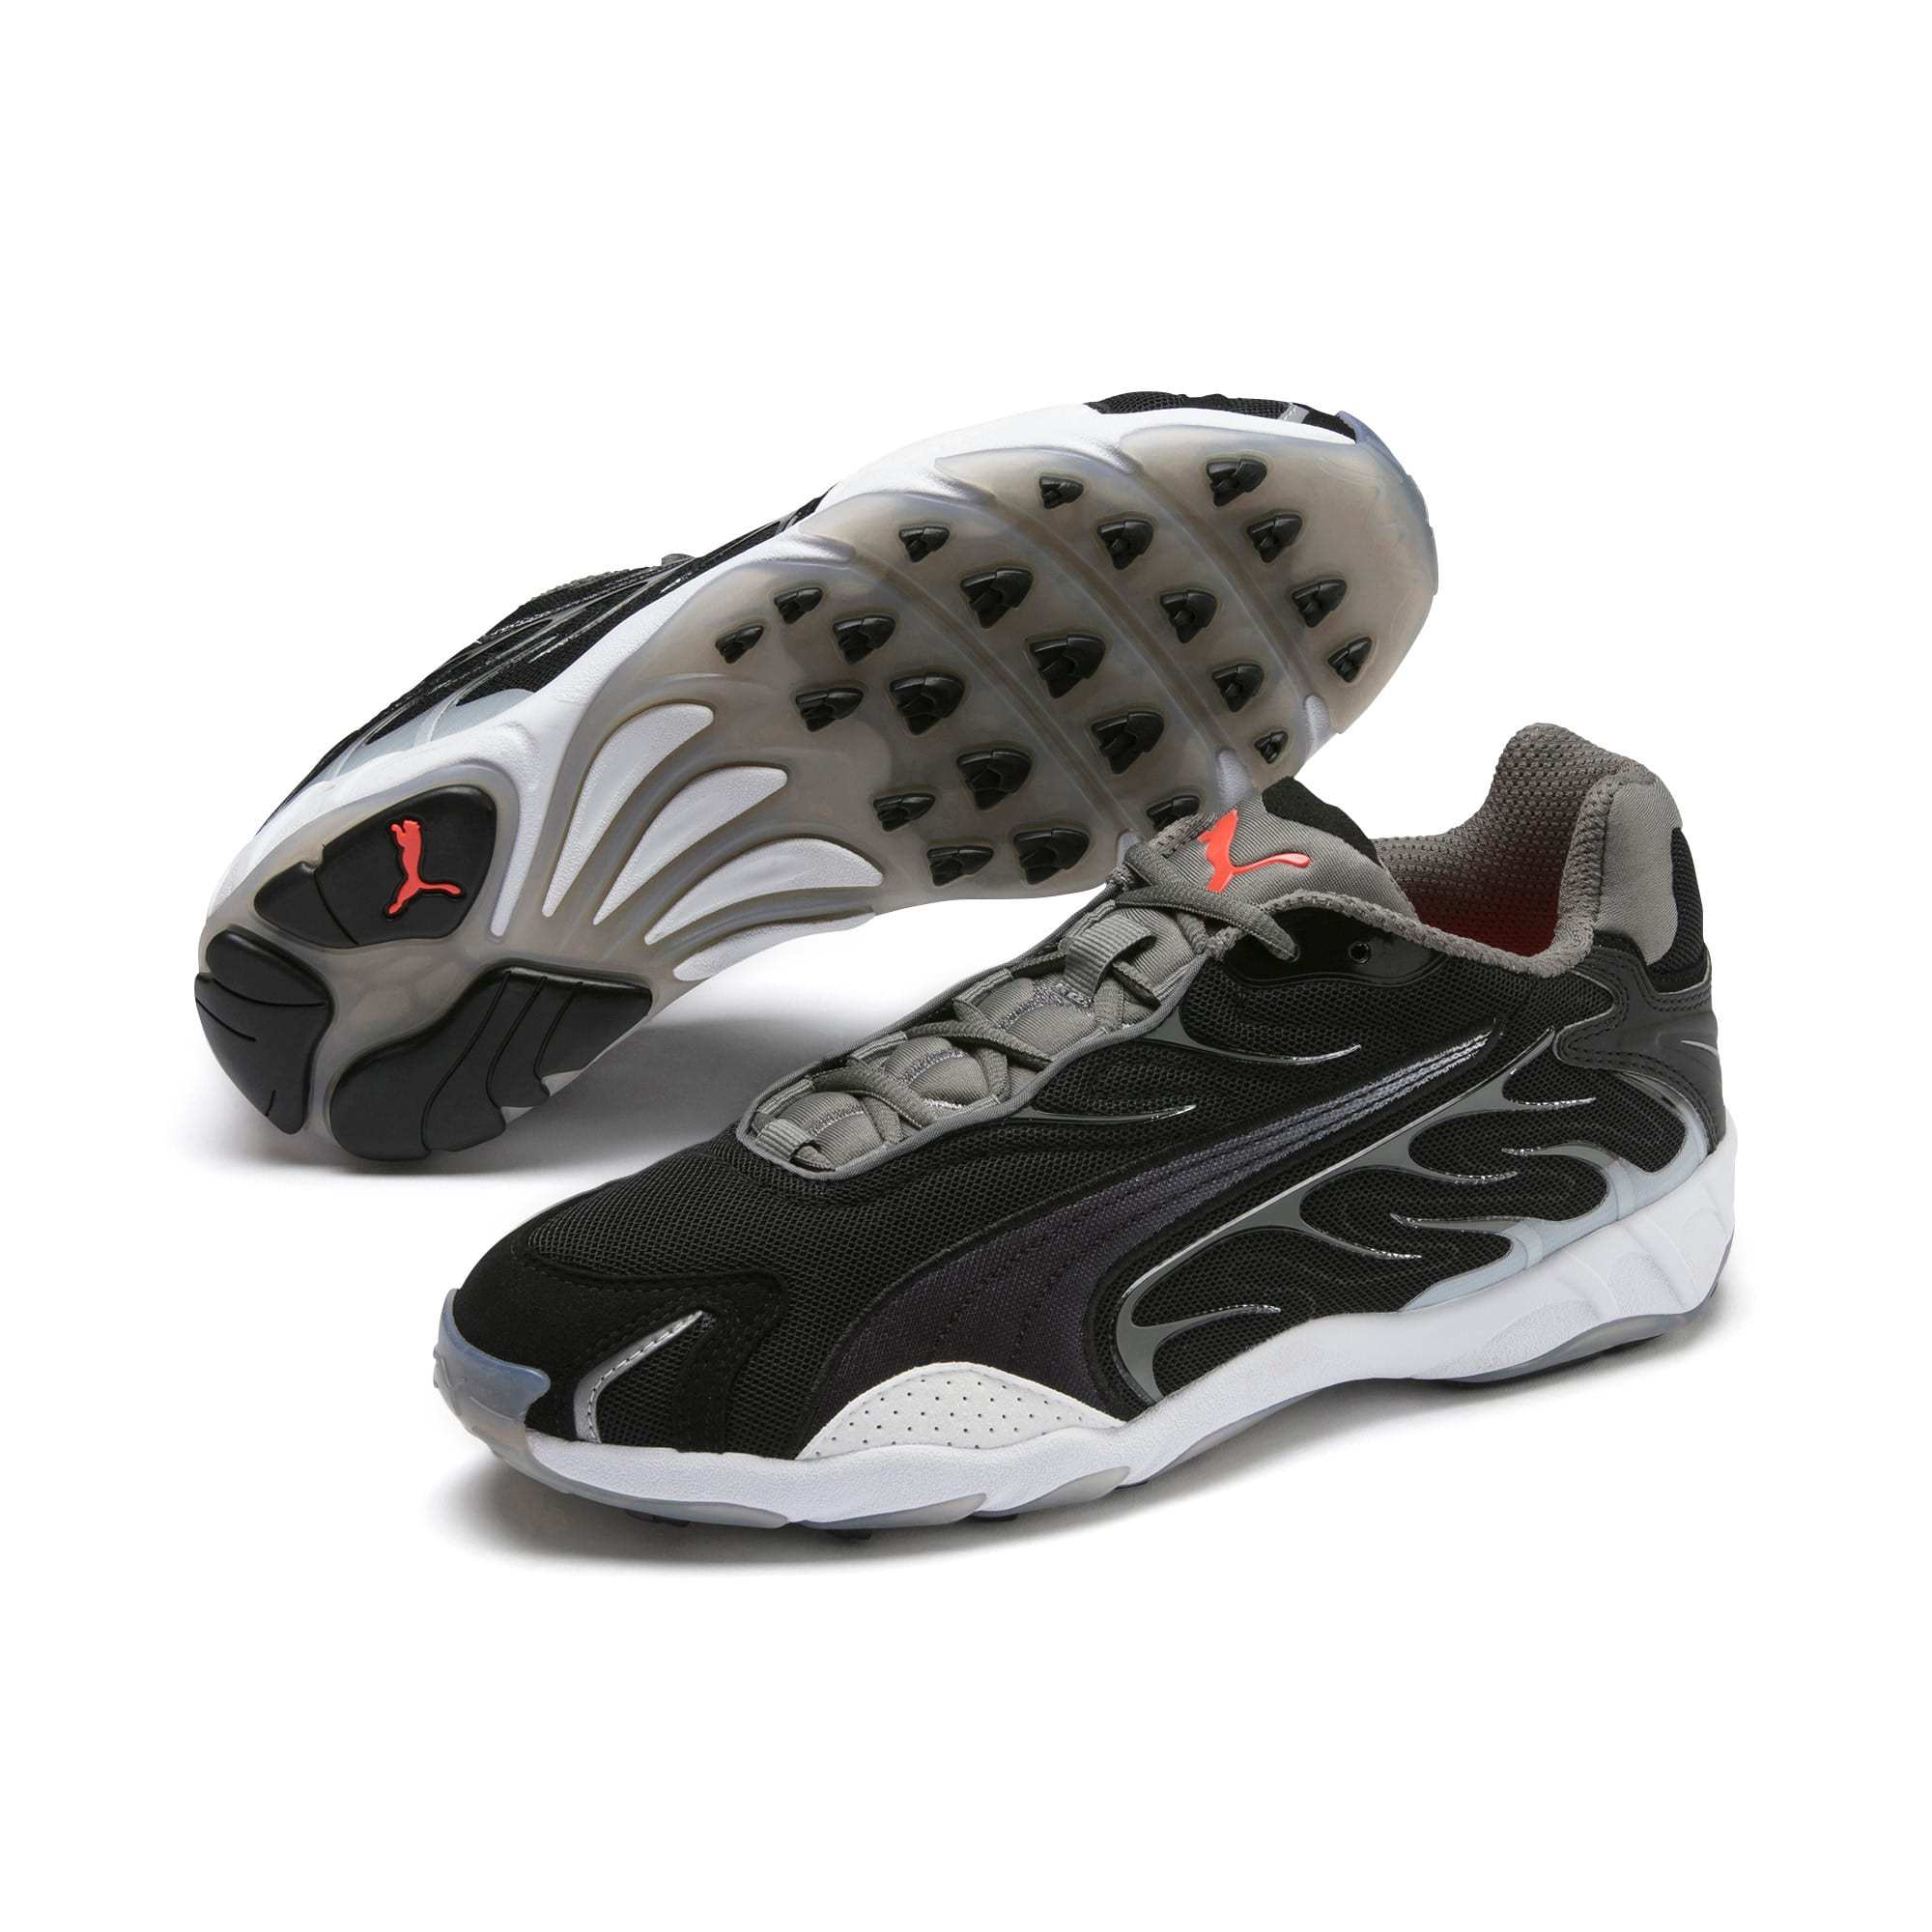 Thumbnail 3 of Inhale Flares Sneakers, Puma Black-Puma White, medium